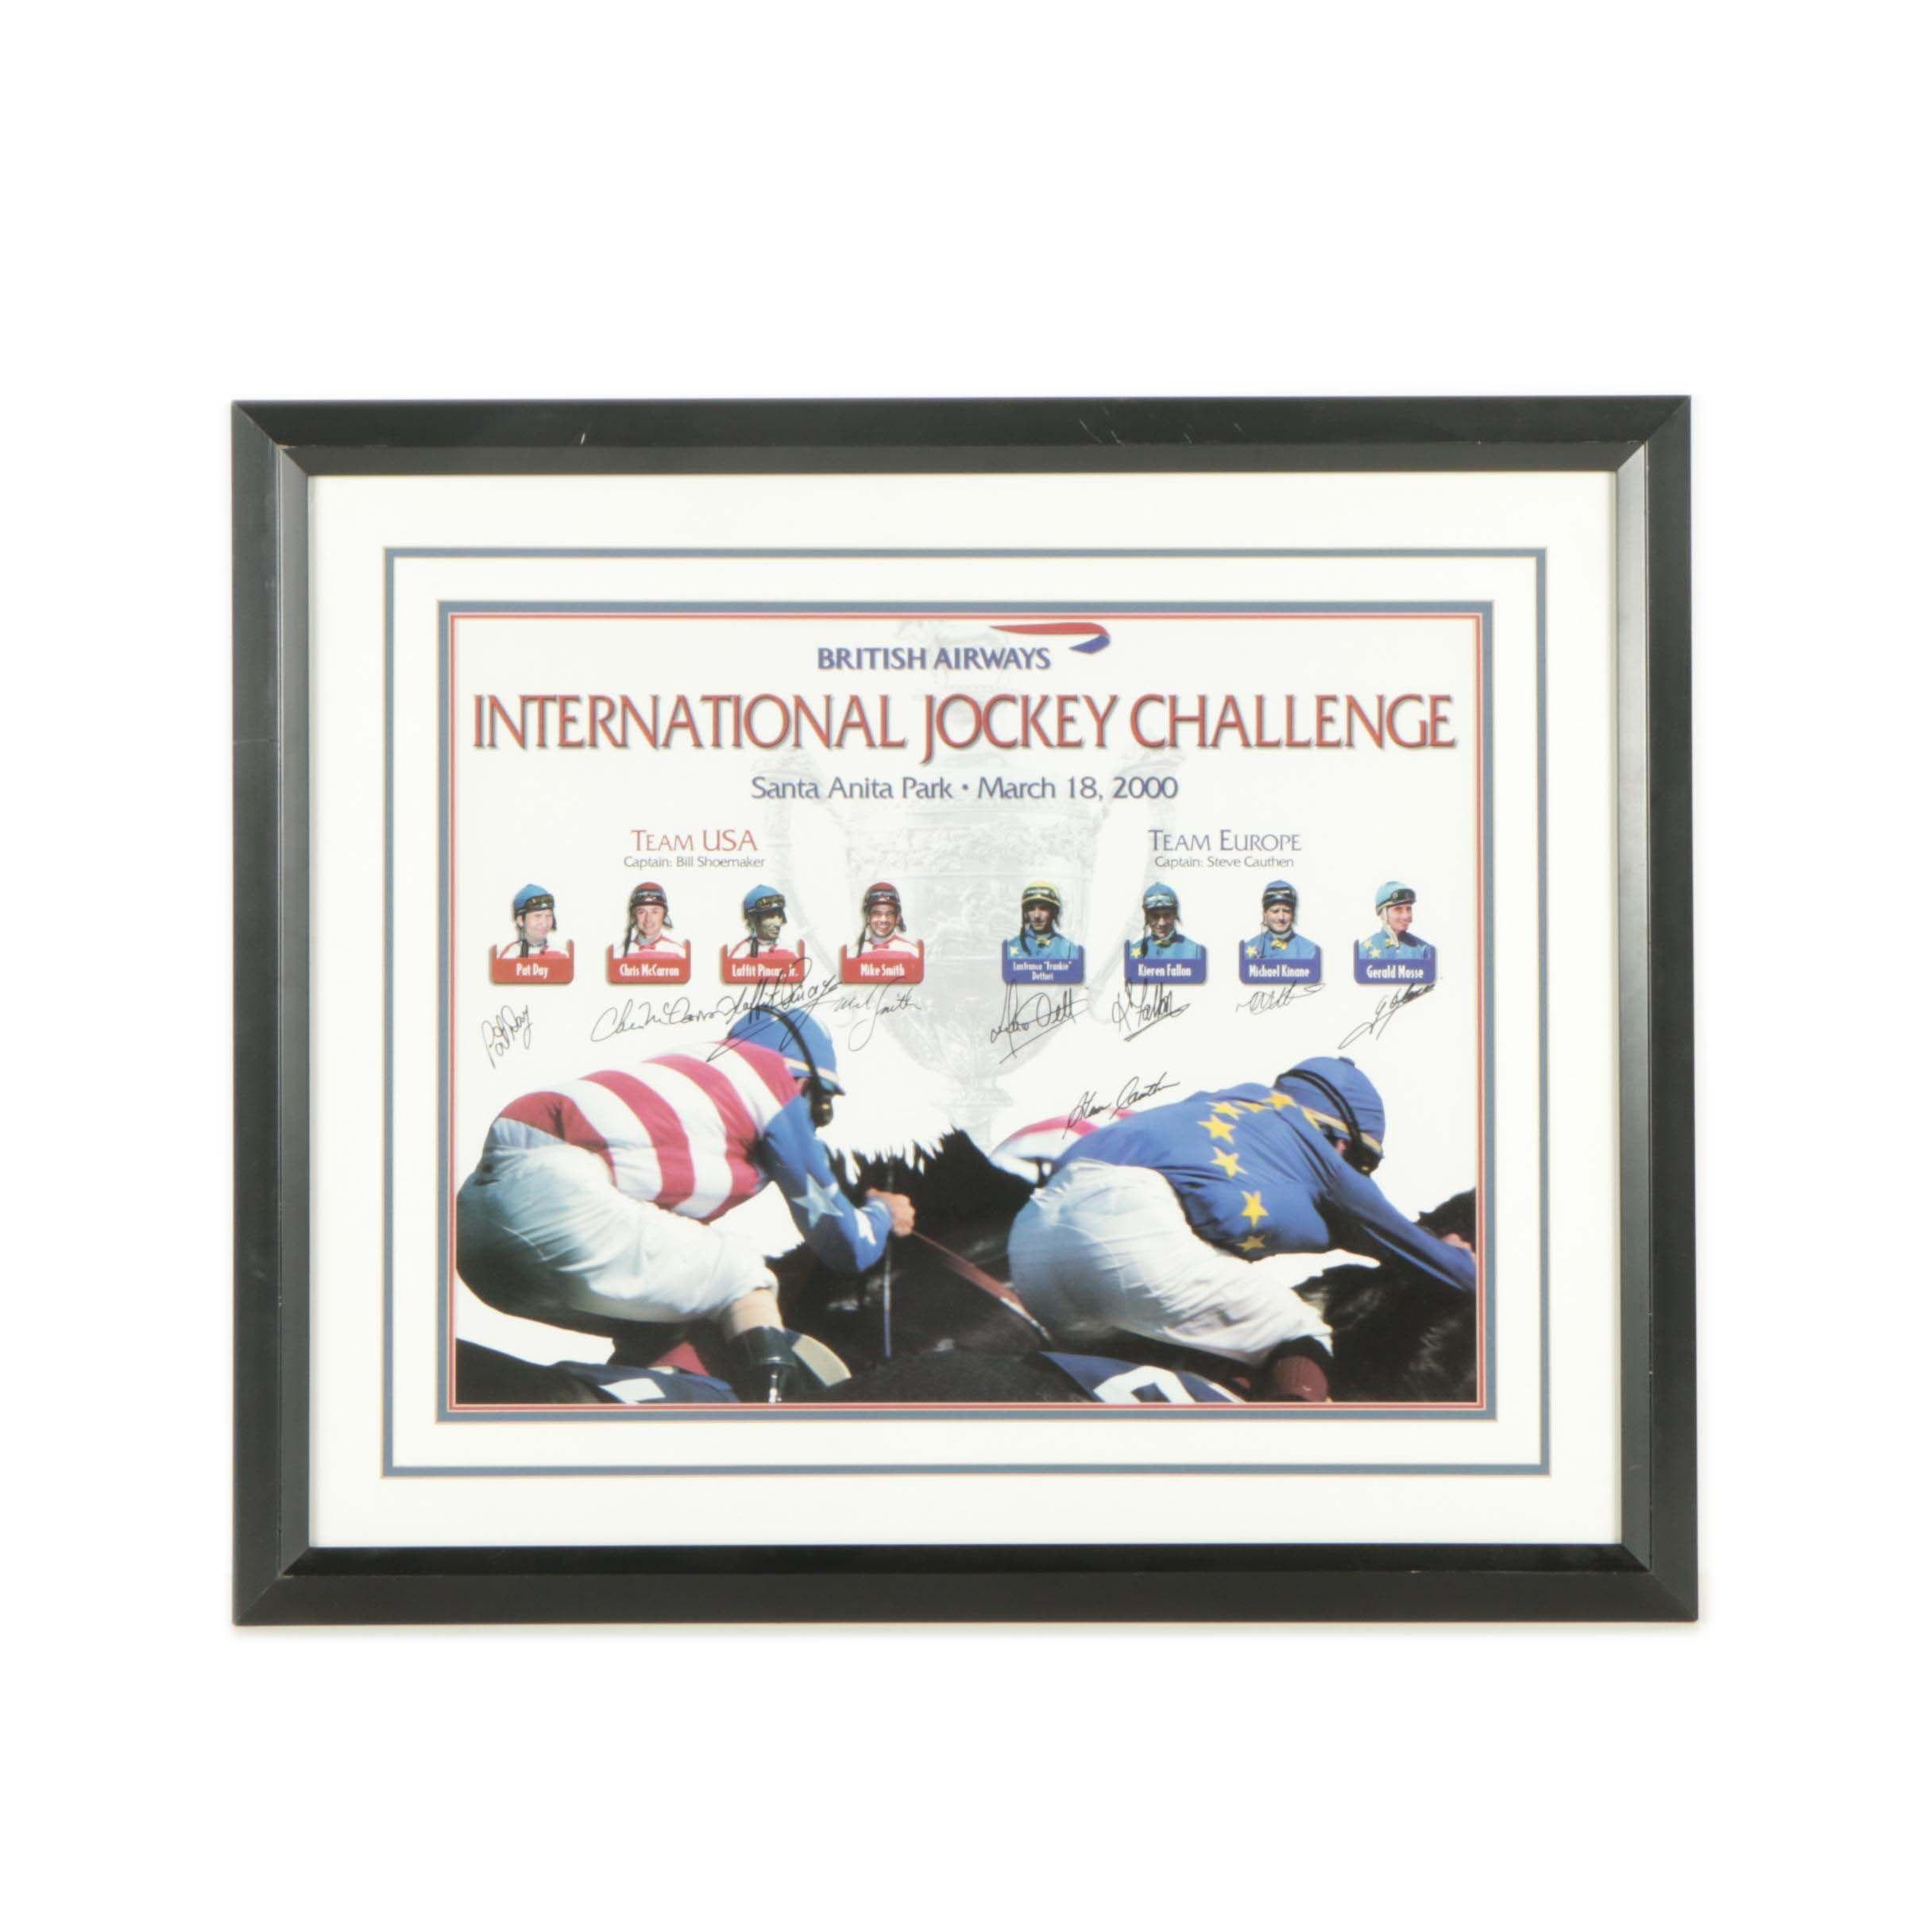 Autographed International Jockey Challenge 2000 Poster